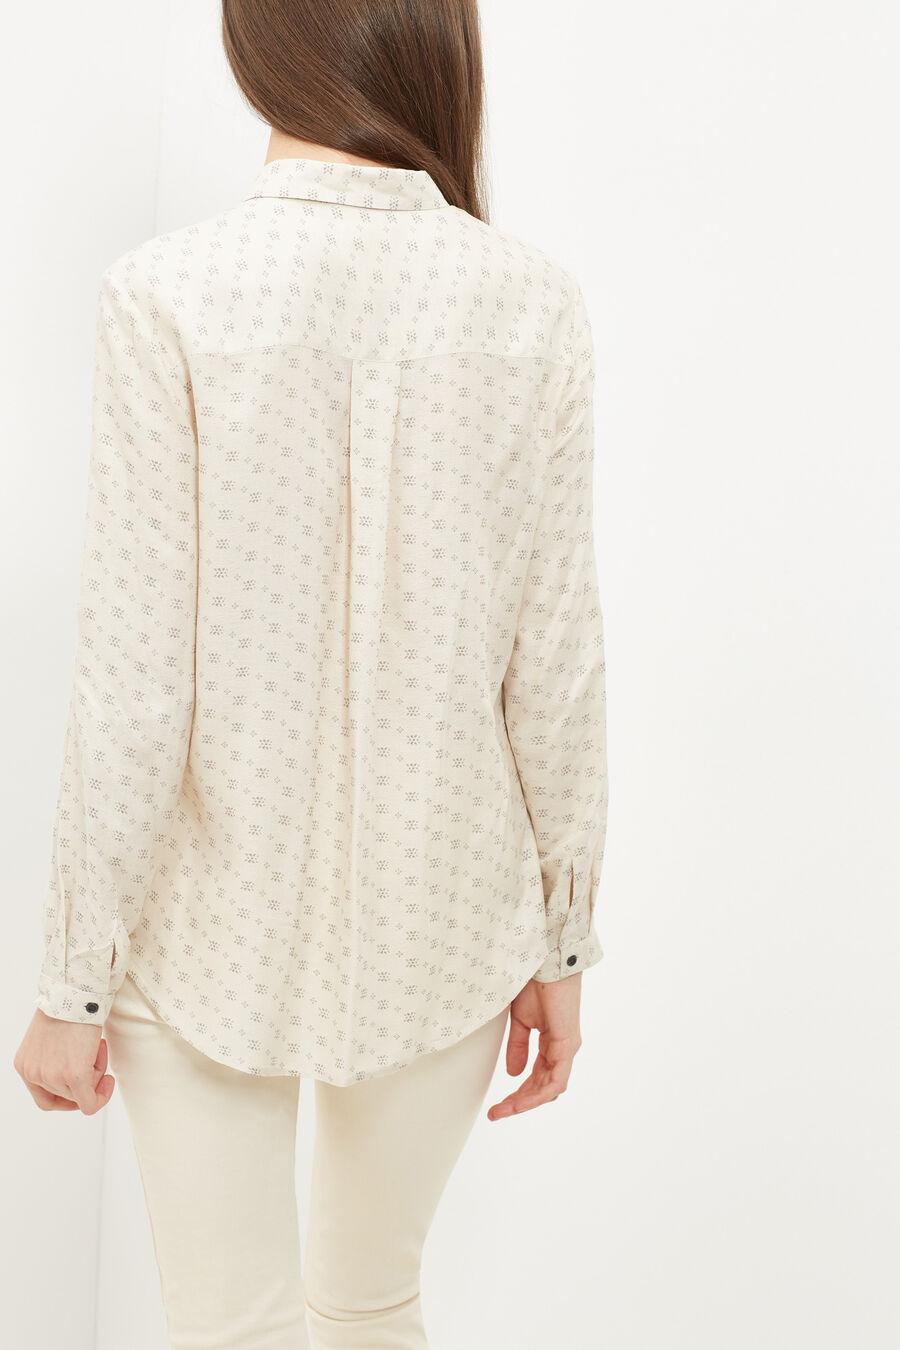 Patterned preppy shirt